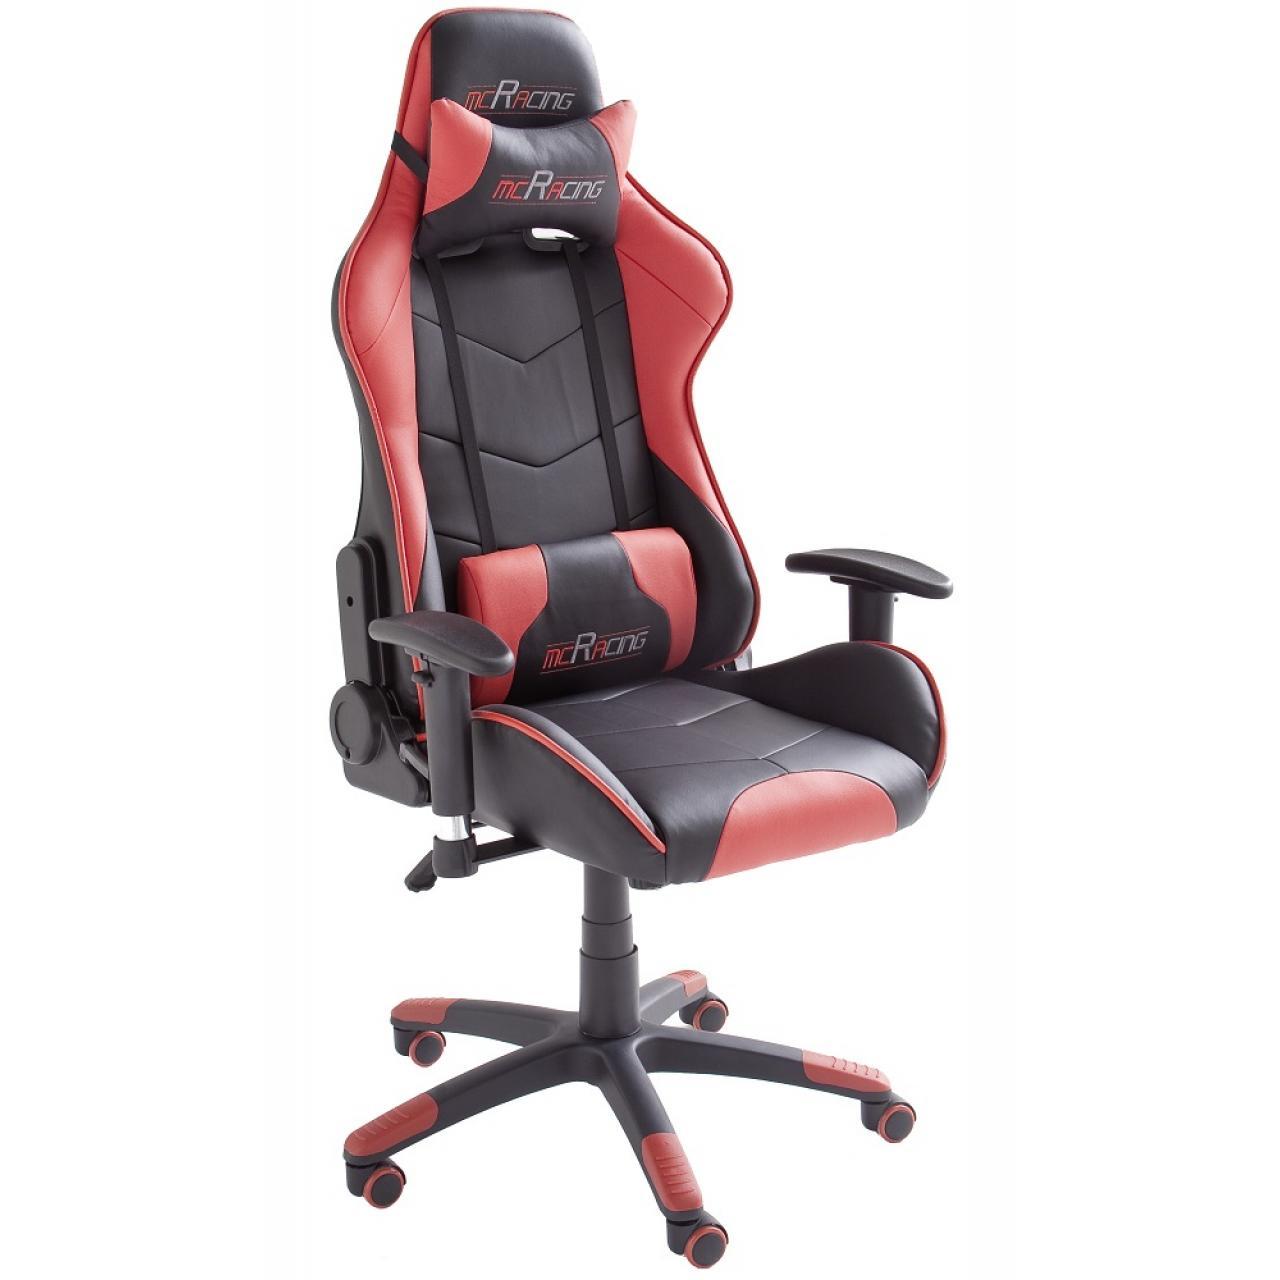 Gamingstuhl mcRacing 5 Schwarz Rot mit Armlehnen Bürostuhl Drehstuhl Gaslift Büro Stuhl